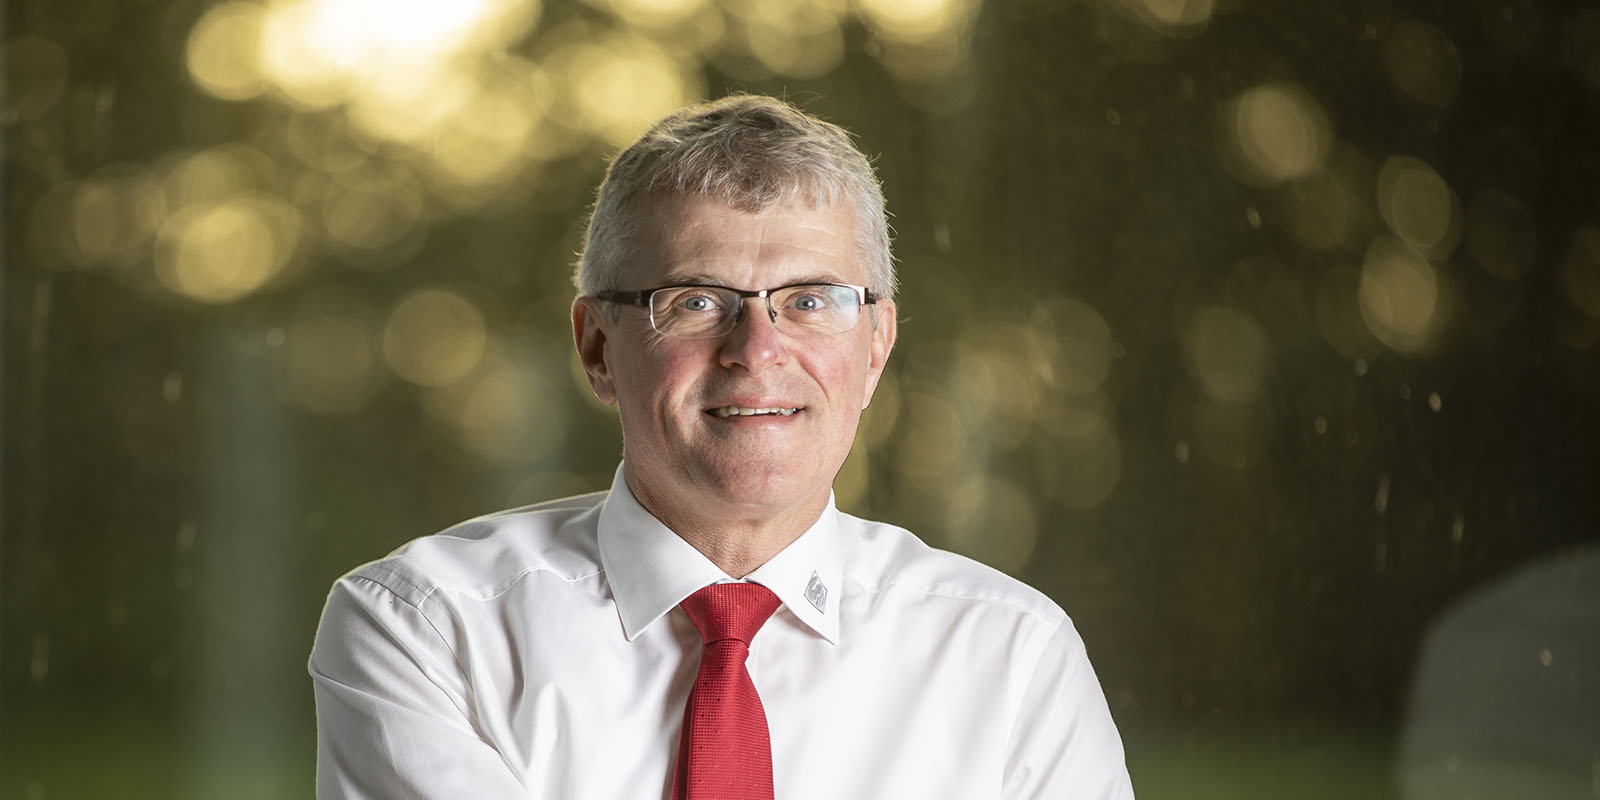 Carsten Klausen